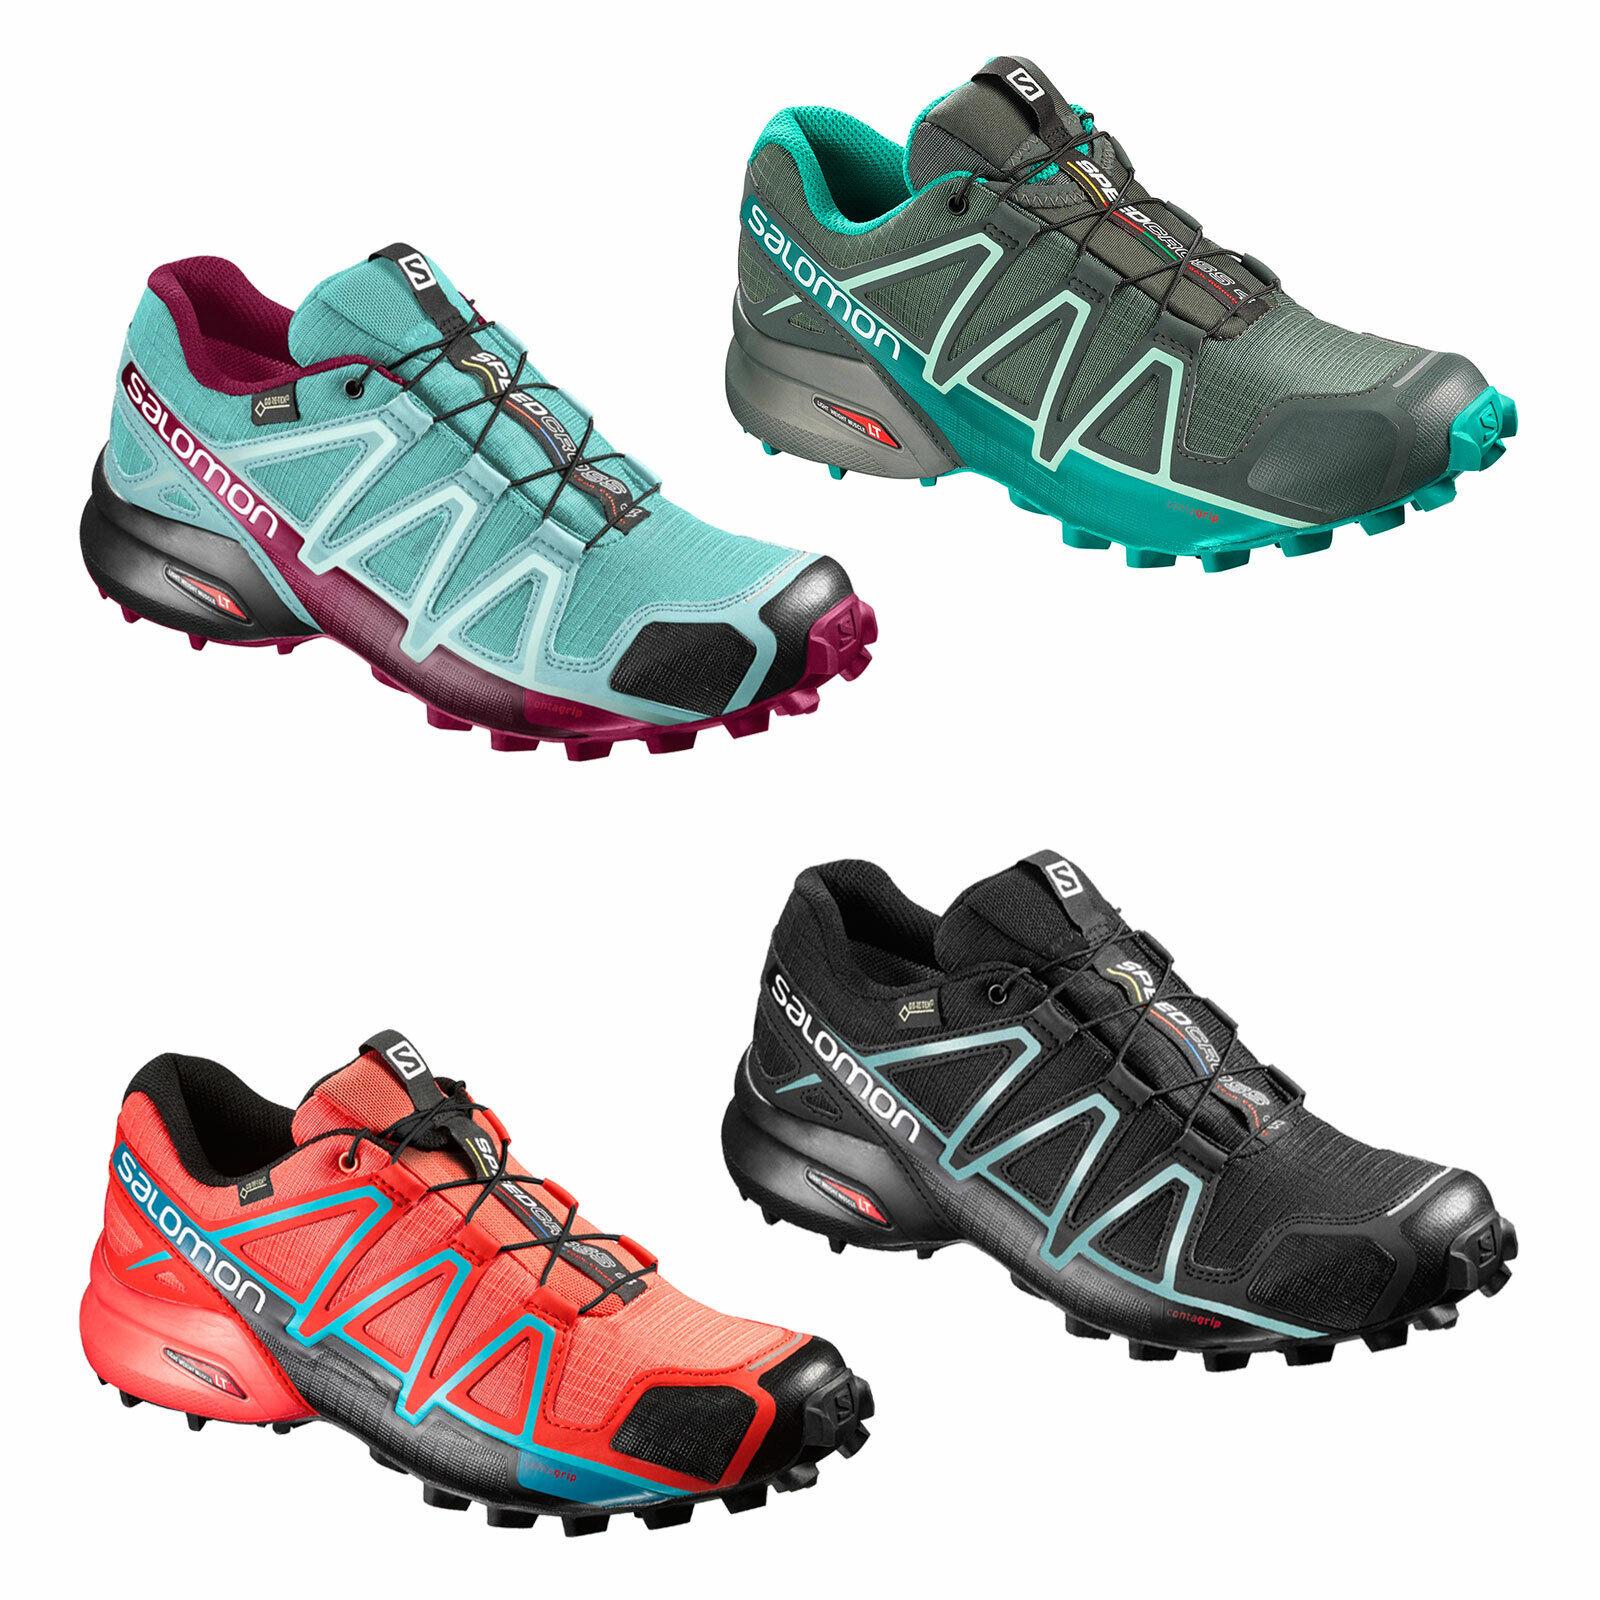 Kundschaft zuerst zum halben Preis Preis Salomon Speedcross 4 W GTX Goretex Women's Running Shoes Outdoor Waterproof